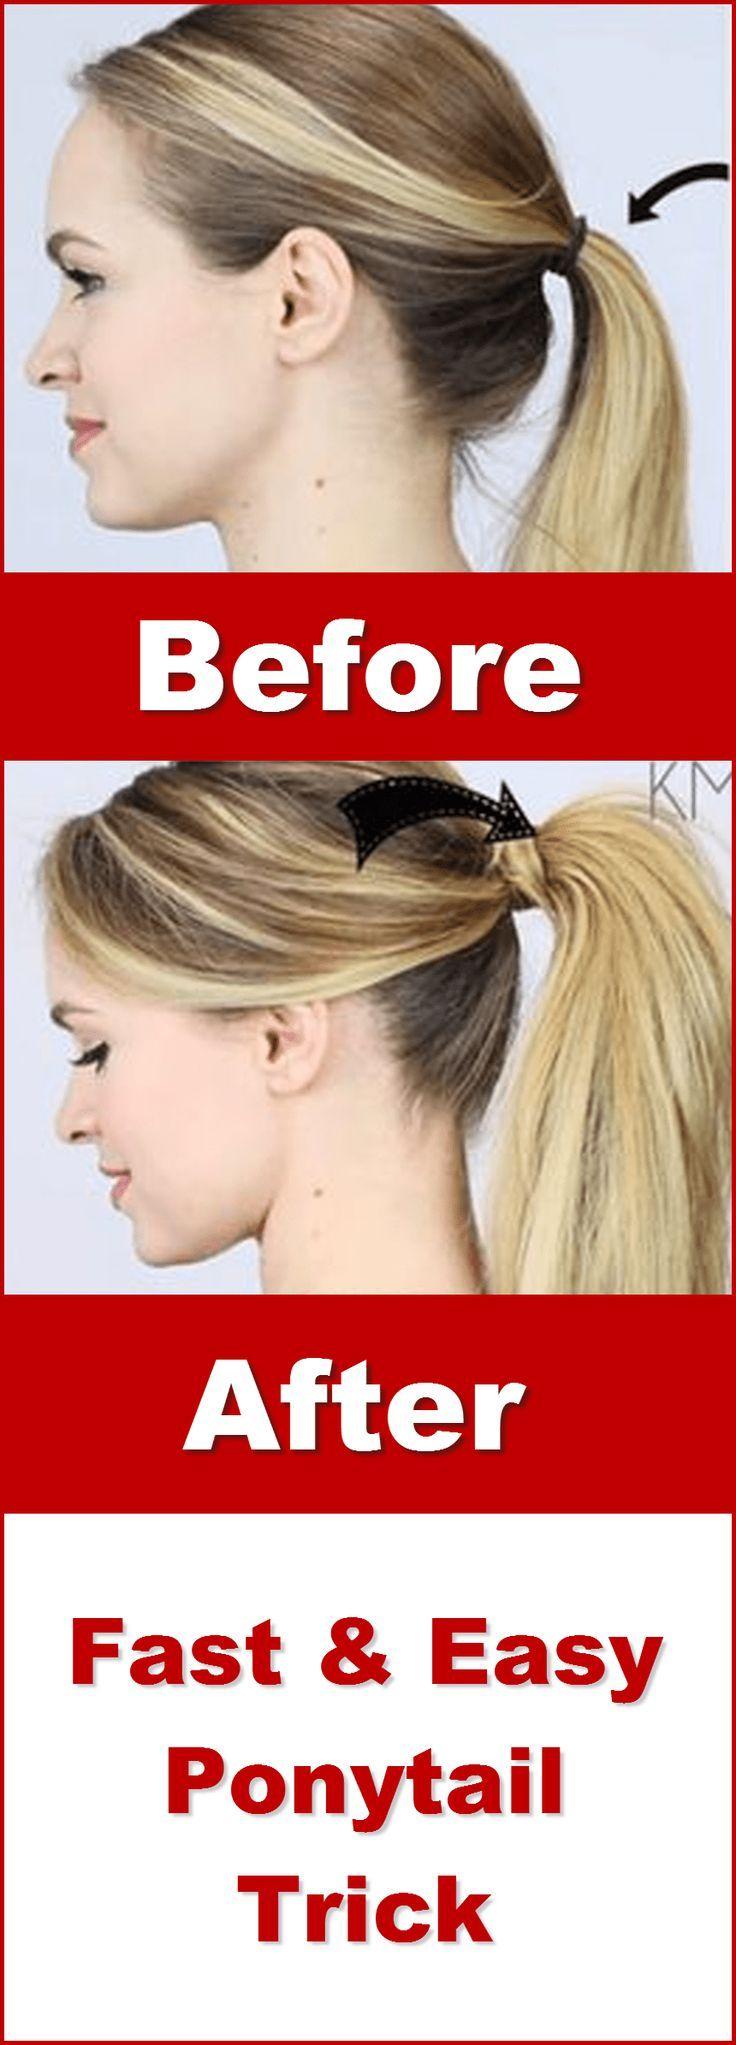 Elegant light ponytail hairstyles – #elegant #philosophy #lightweight #ponytail #fatly